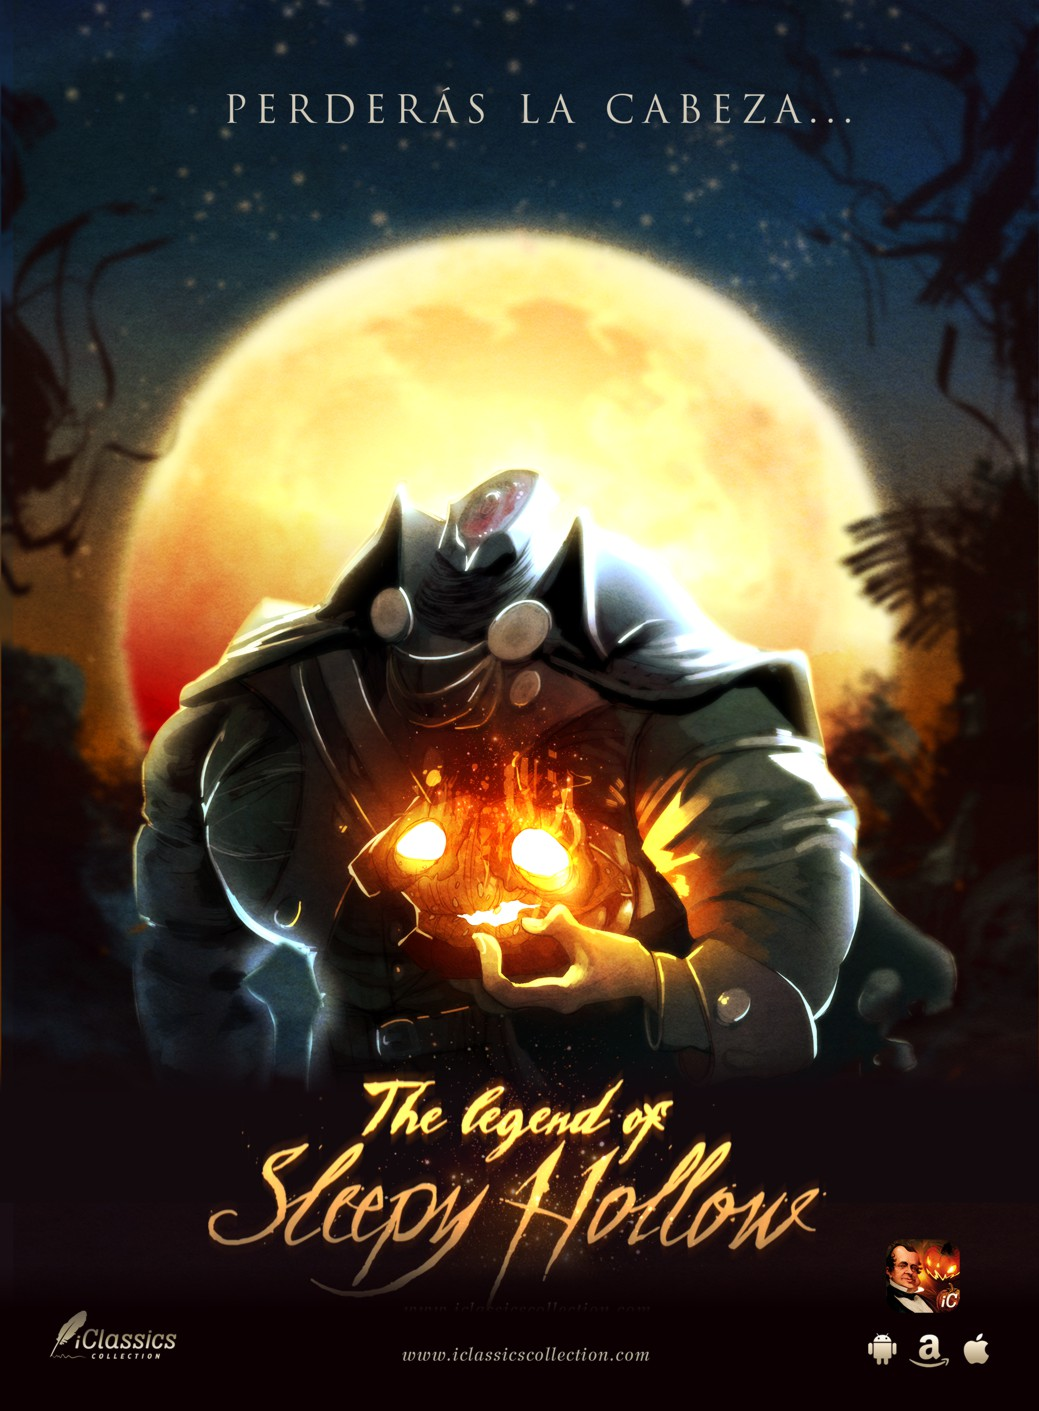 La leyenda de Sleepy Hollow. Lectura inmersiva by iClassics